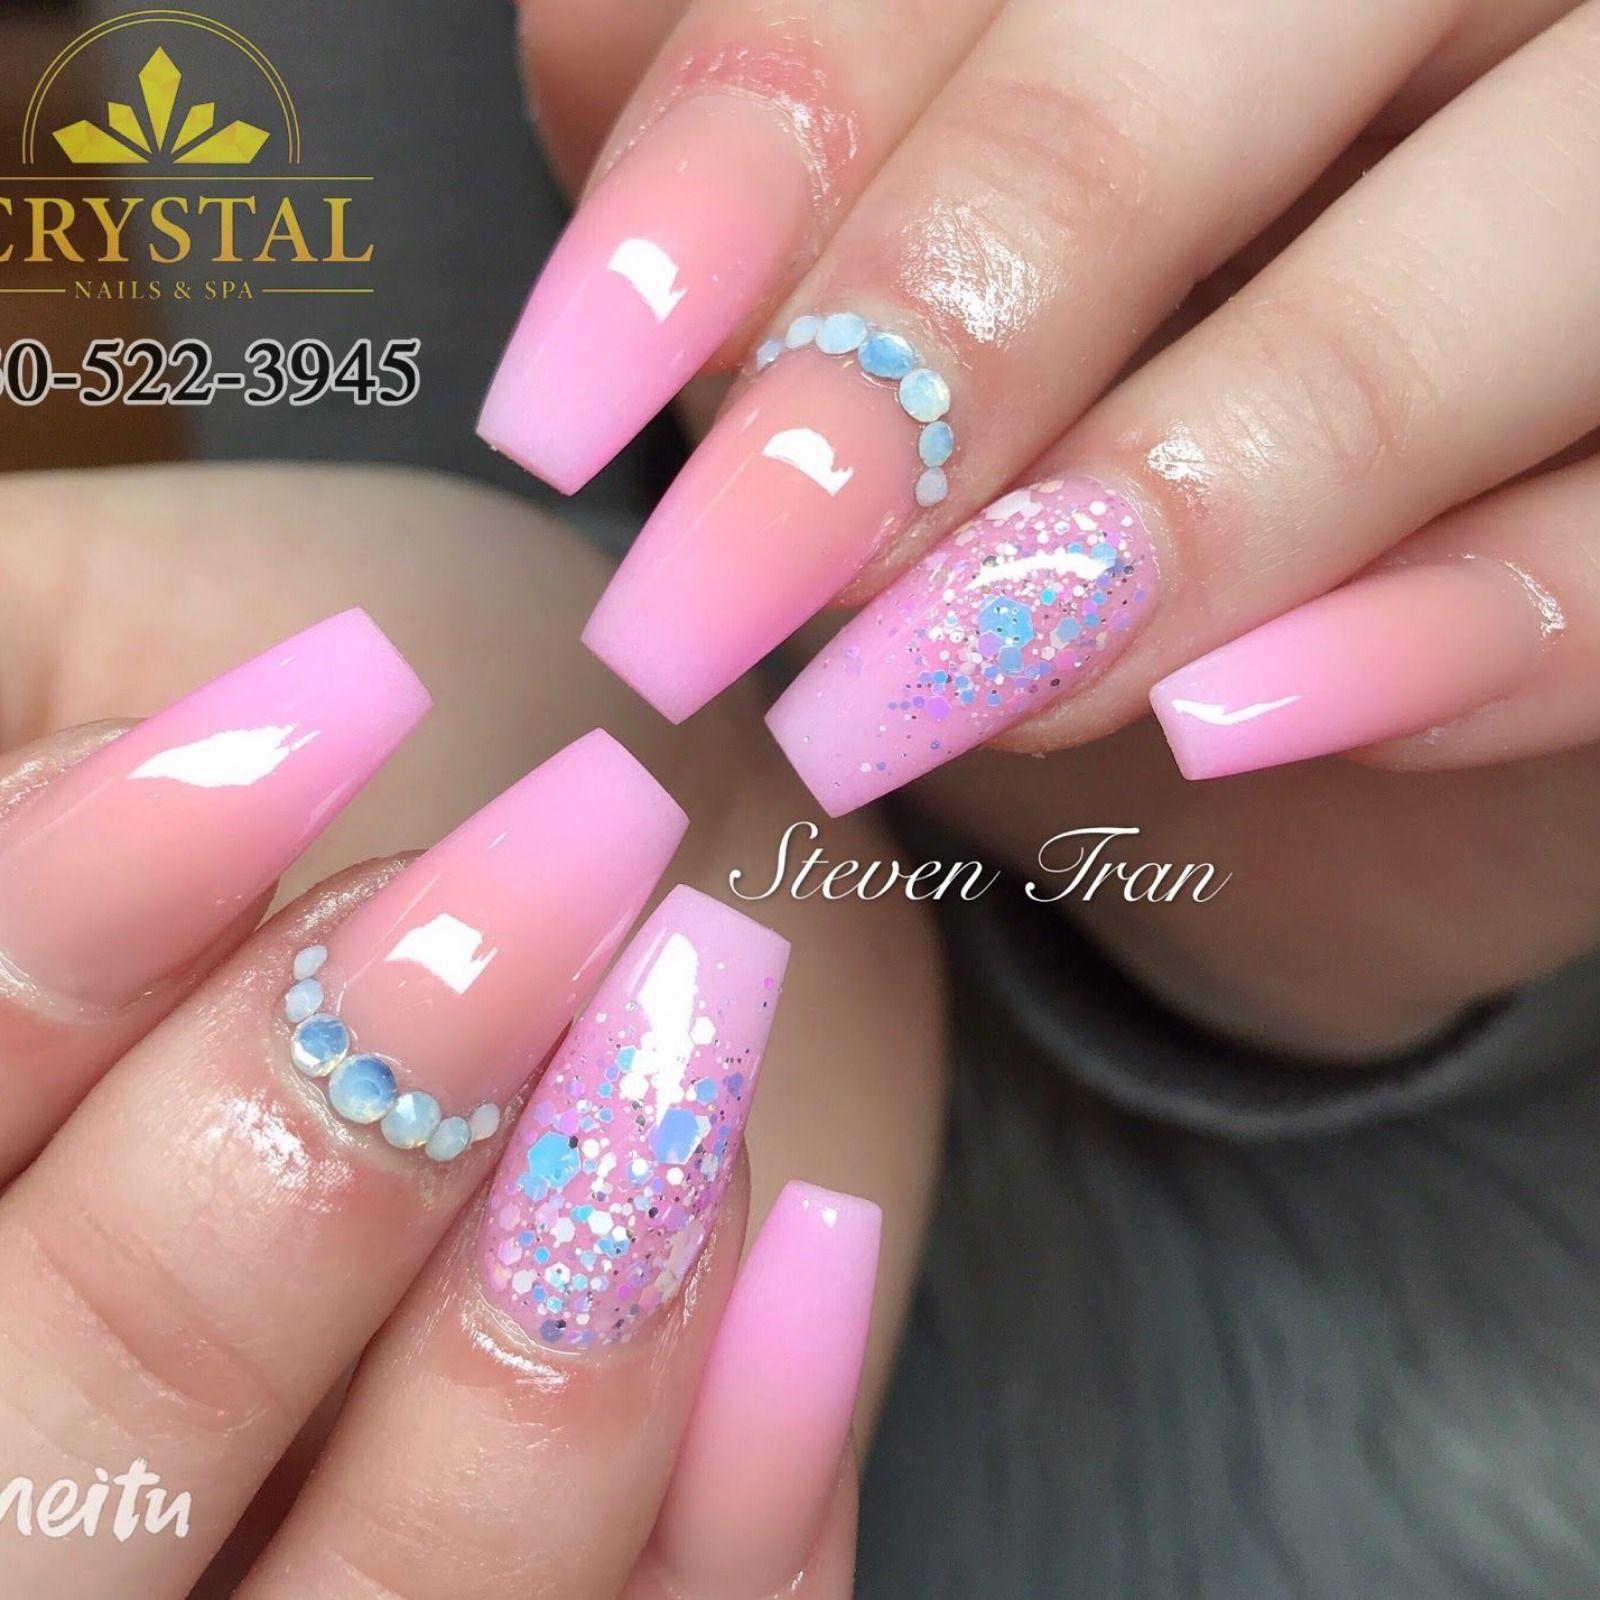 Crystal Nails Spa Nails Salon In Willowbrook Illinois 60527 Nail Salon And Spa Crystal Nails Manicure